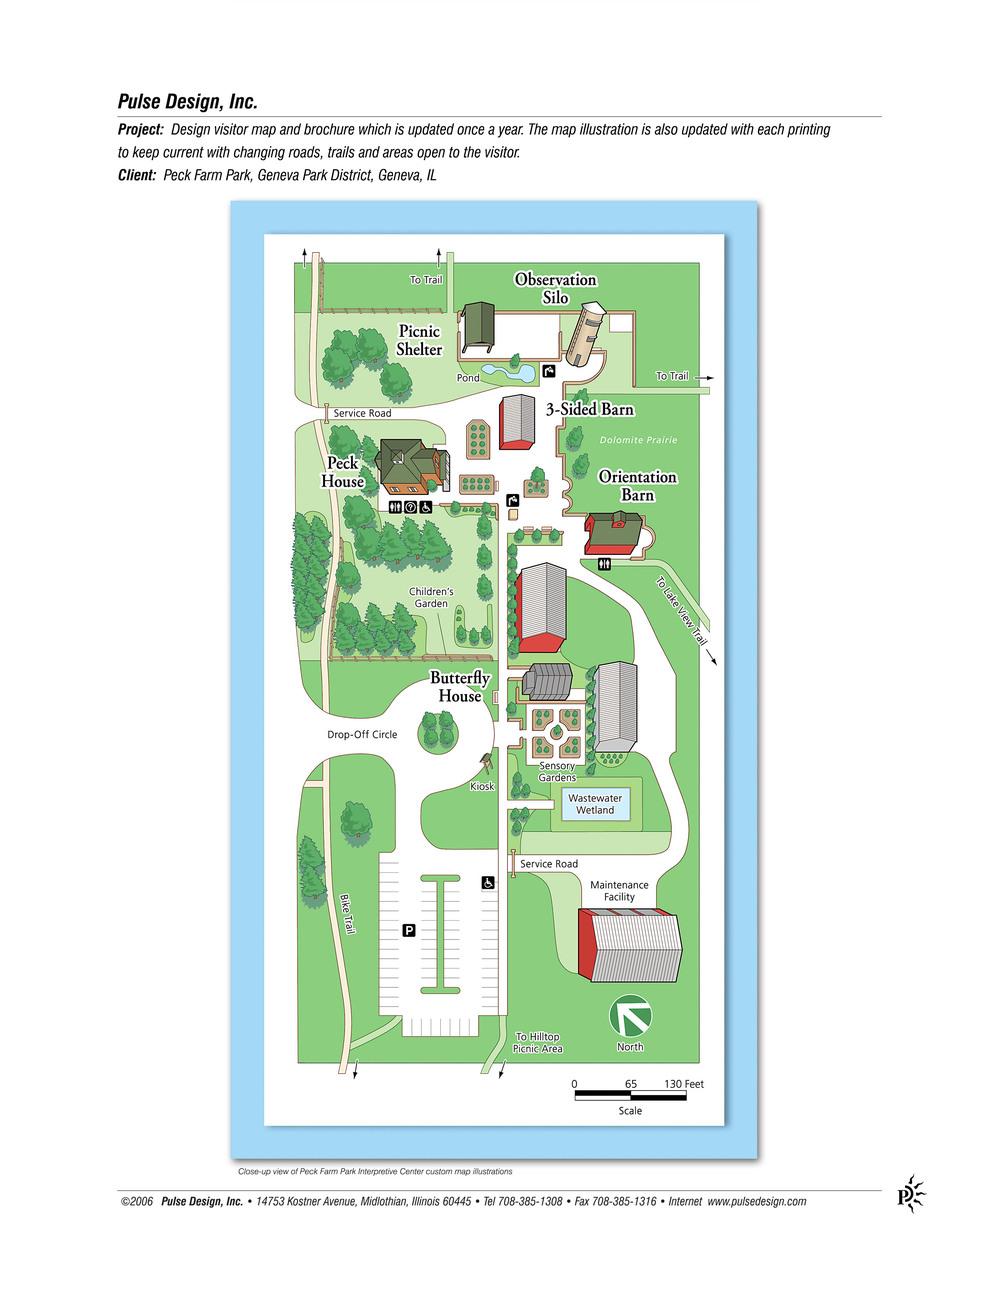 Peck-Farm-Brochure-Map-1-Pulse-Design-Inc.jpg